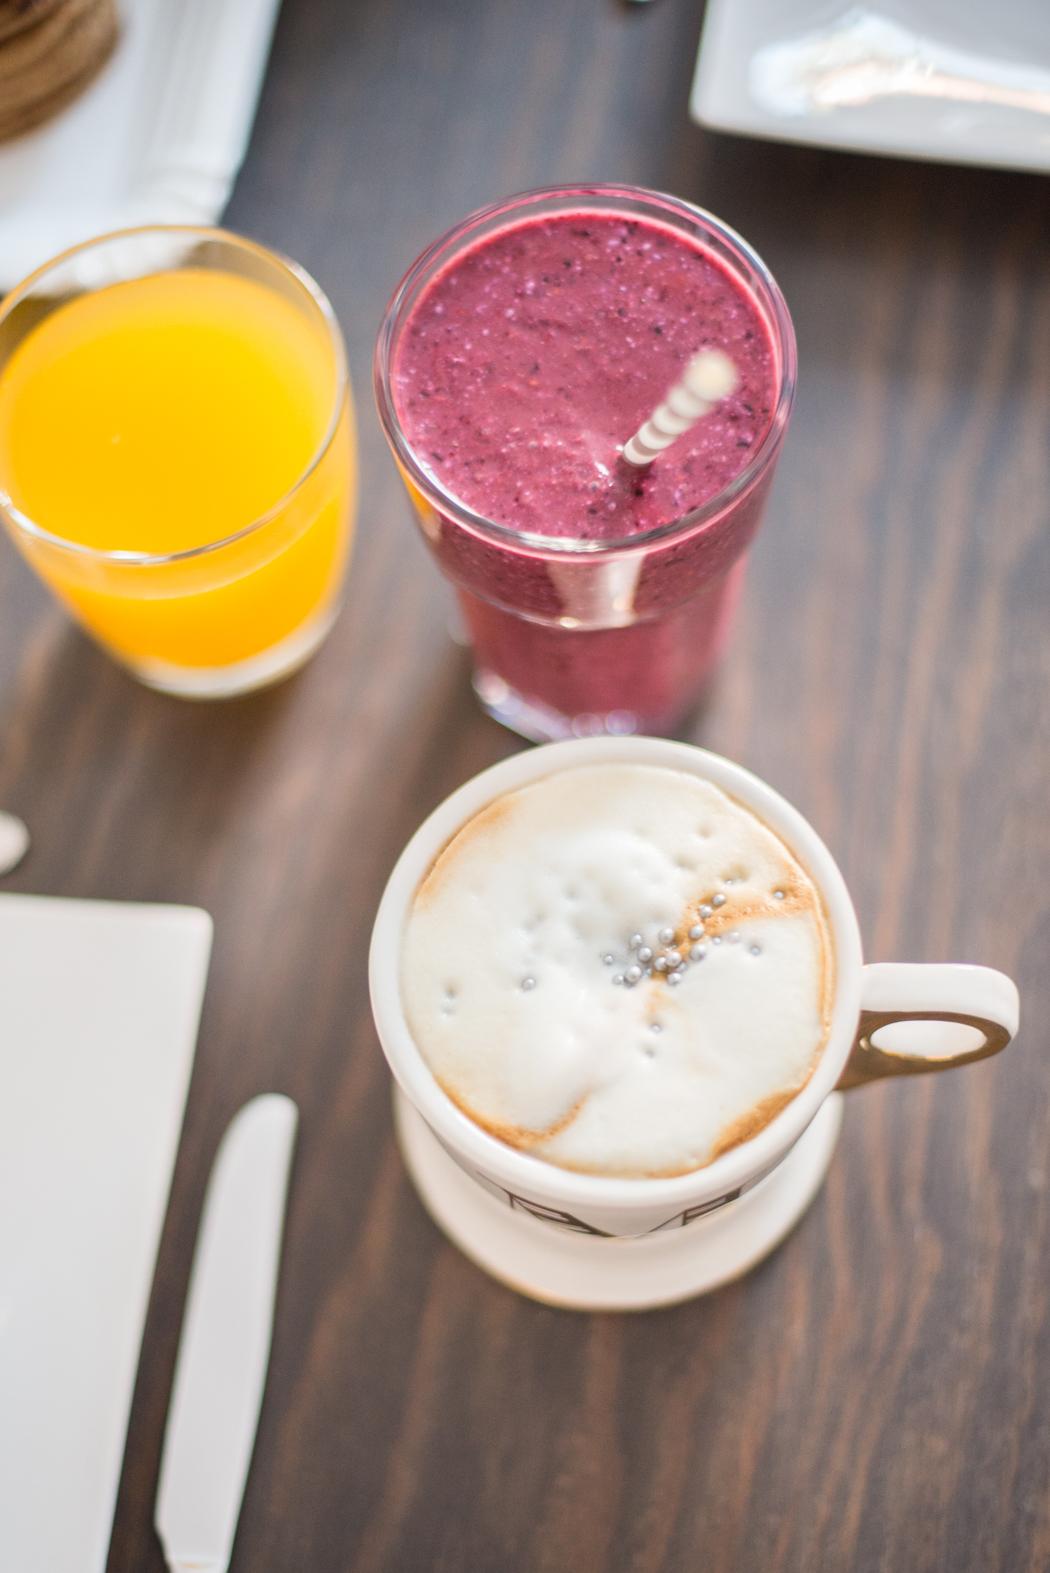 Foodblogger-München-Foodblog-Deutschland-Lindarella-veganes-Frühstück-Frühstücksinspiration-vegane-Pancakes-Clean-Eating-2